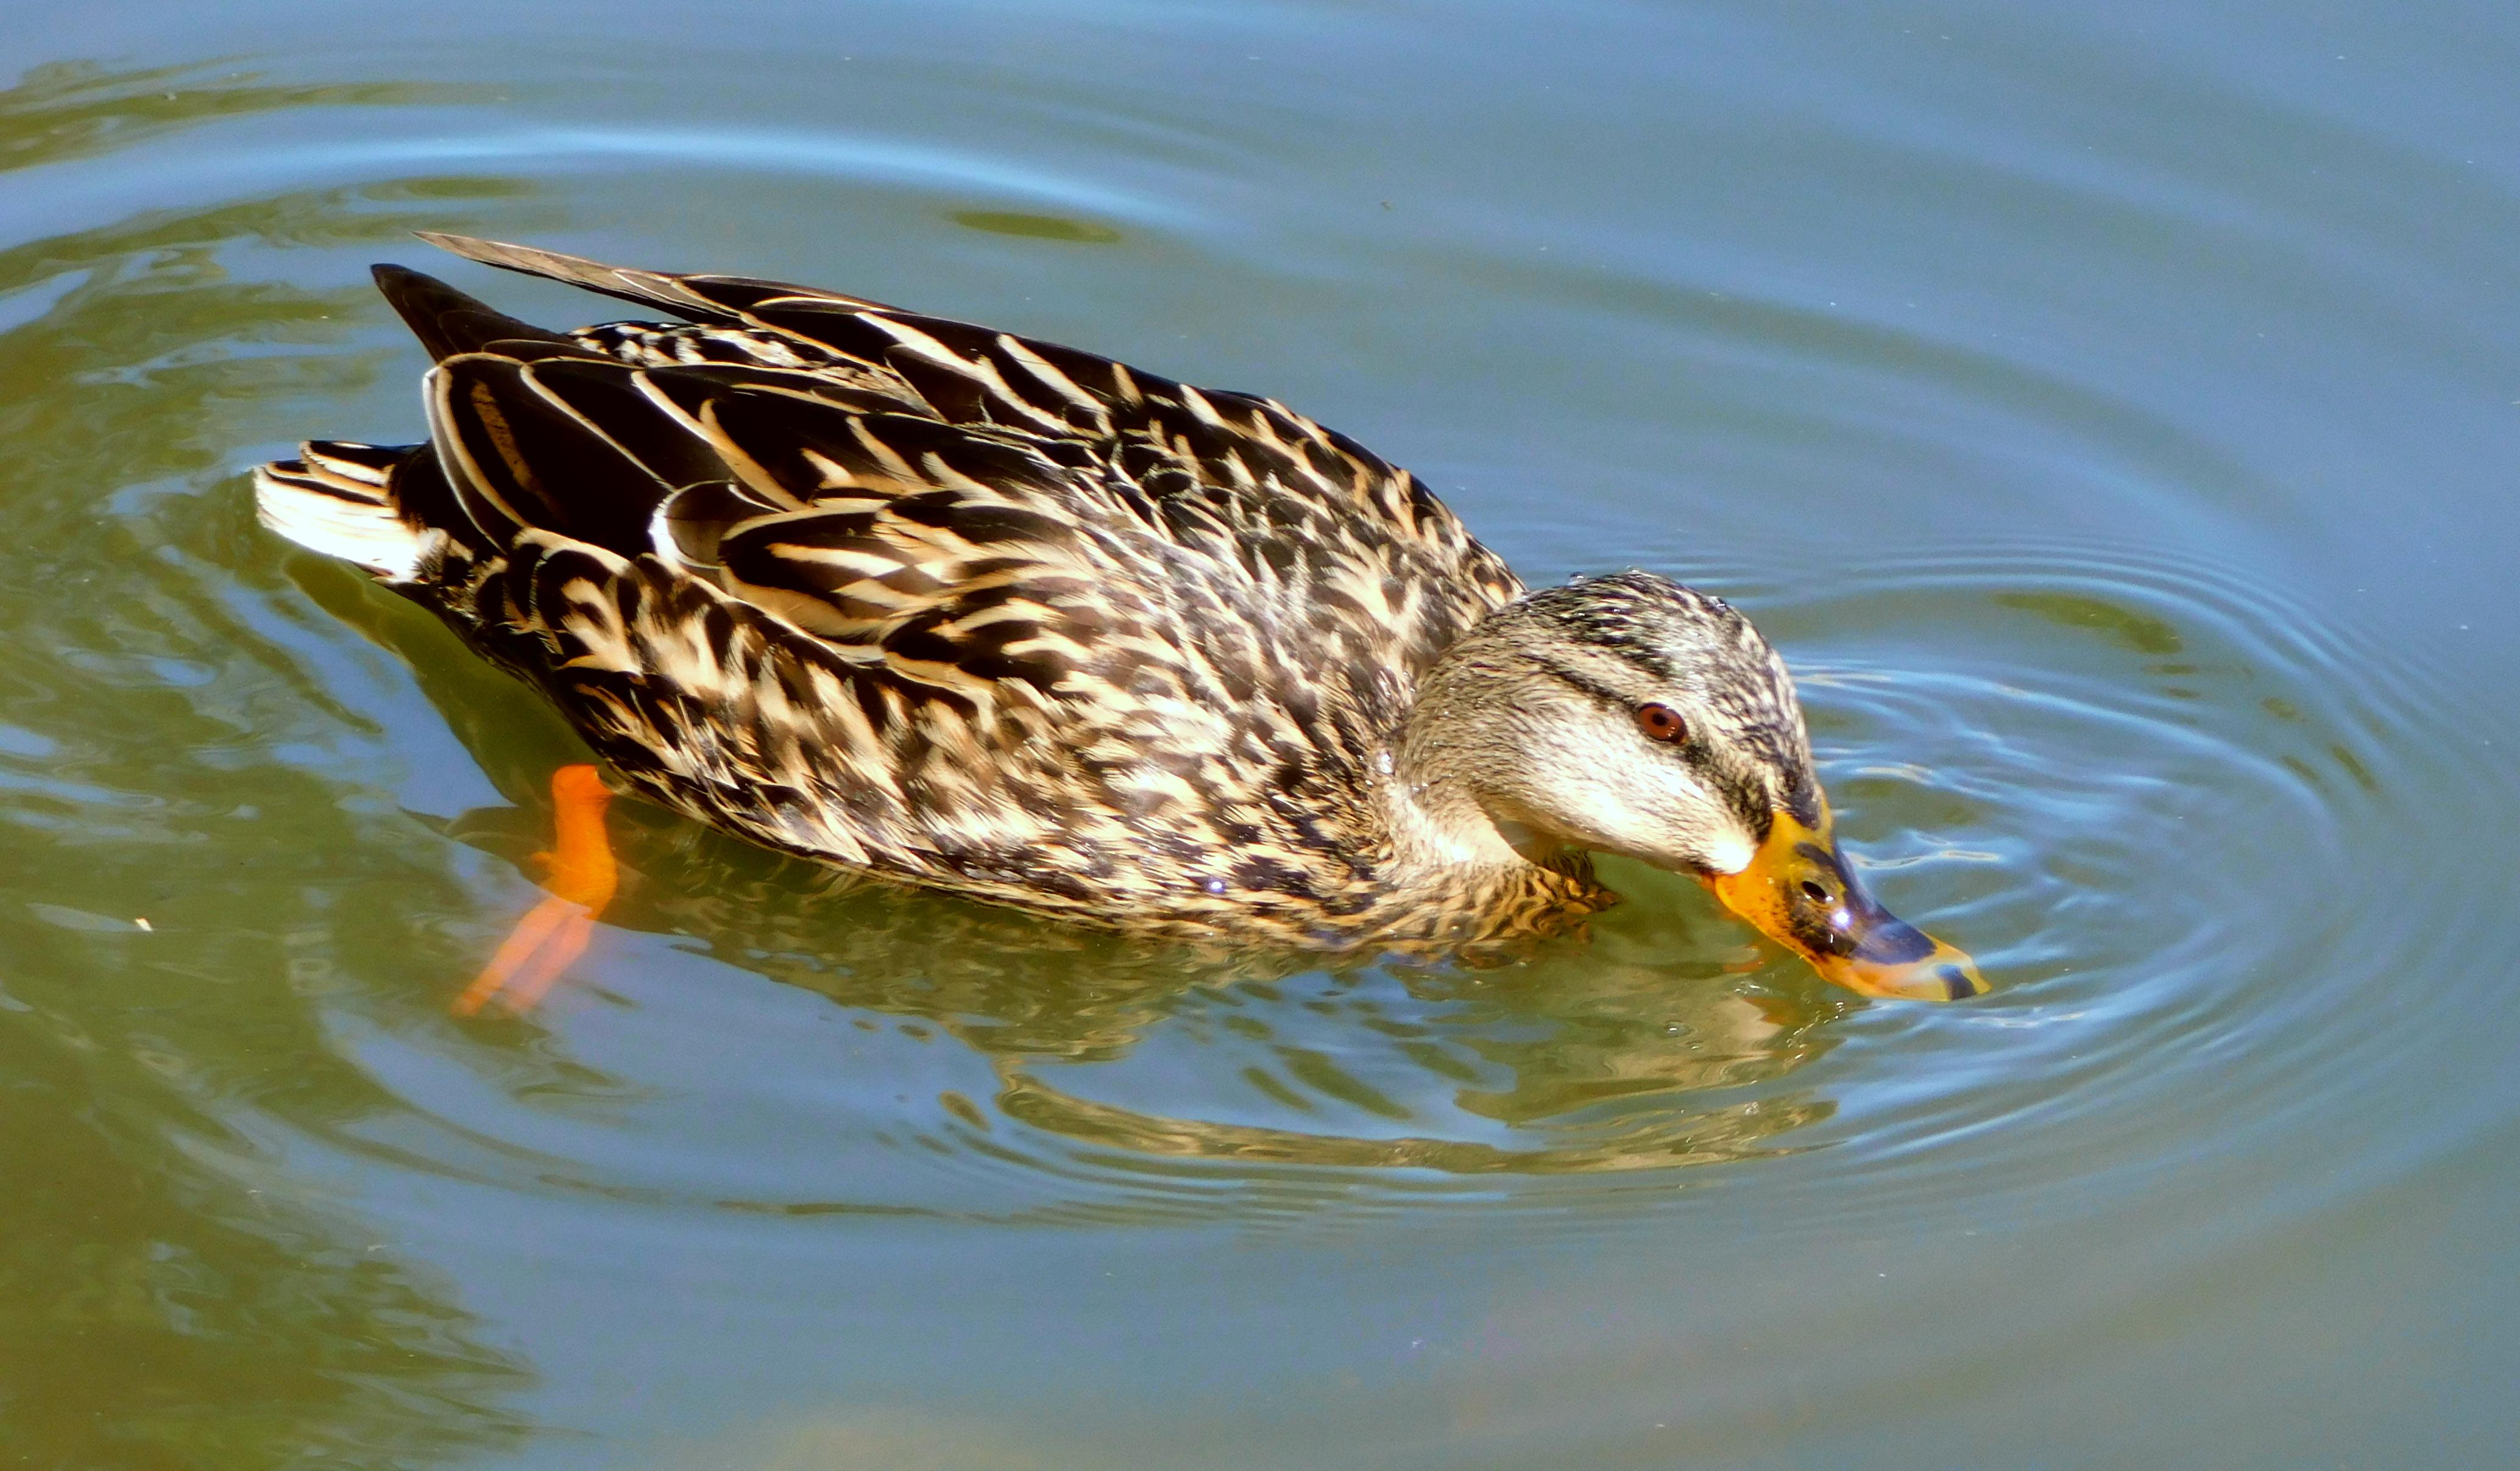 Female Mallard swimming